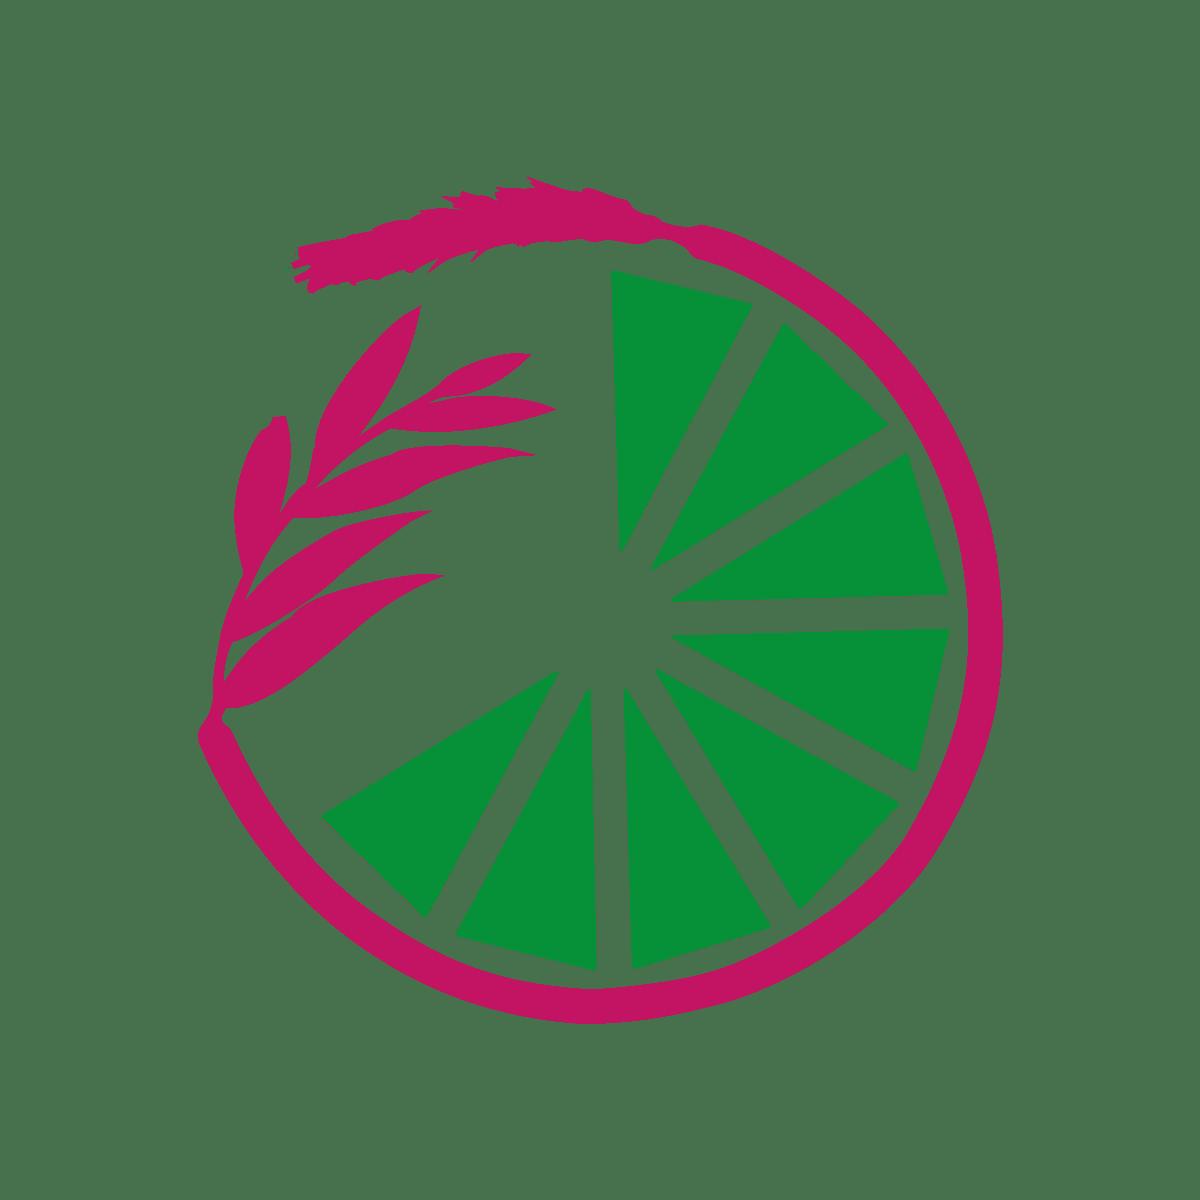 Logotipo de Centro Aguere, consulta de nutrición en La Laguna